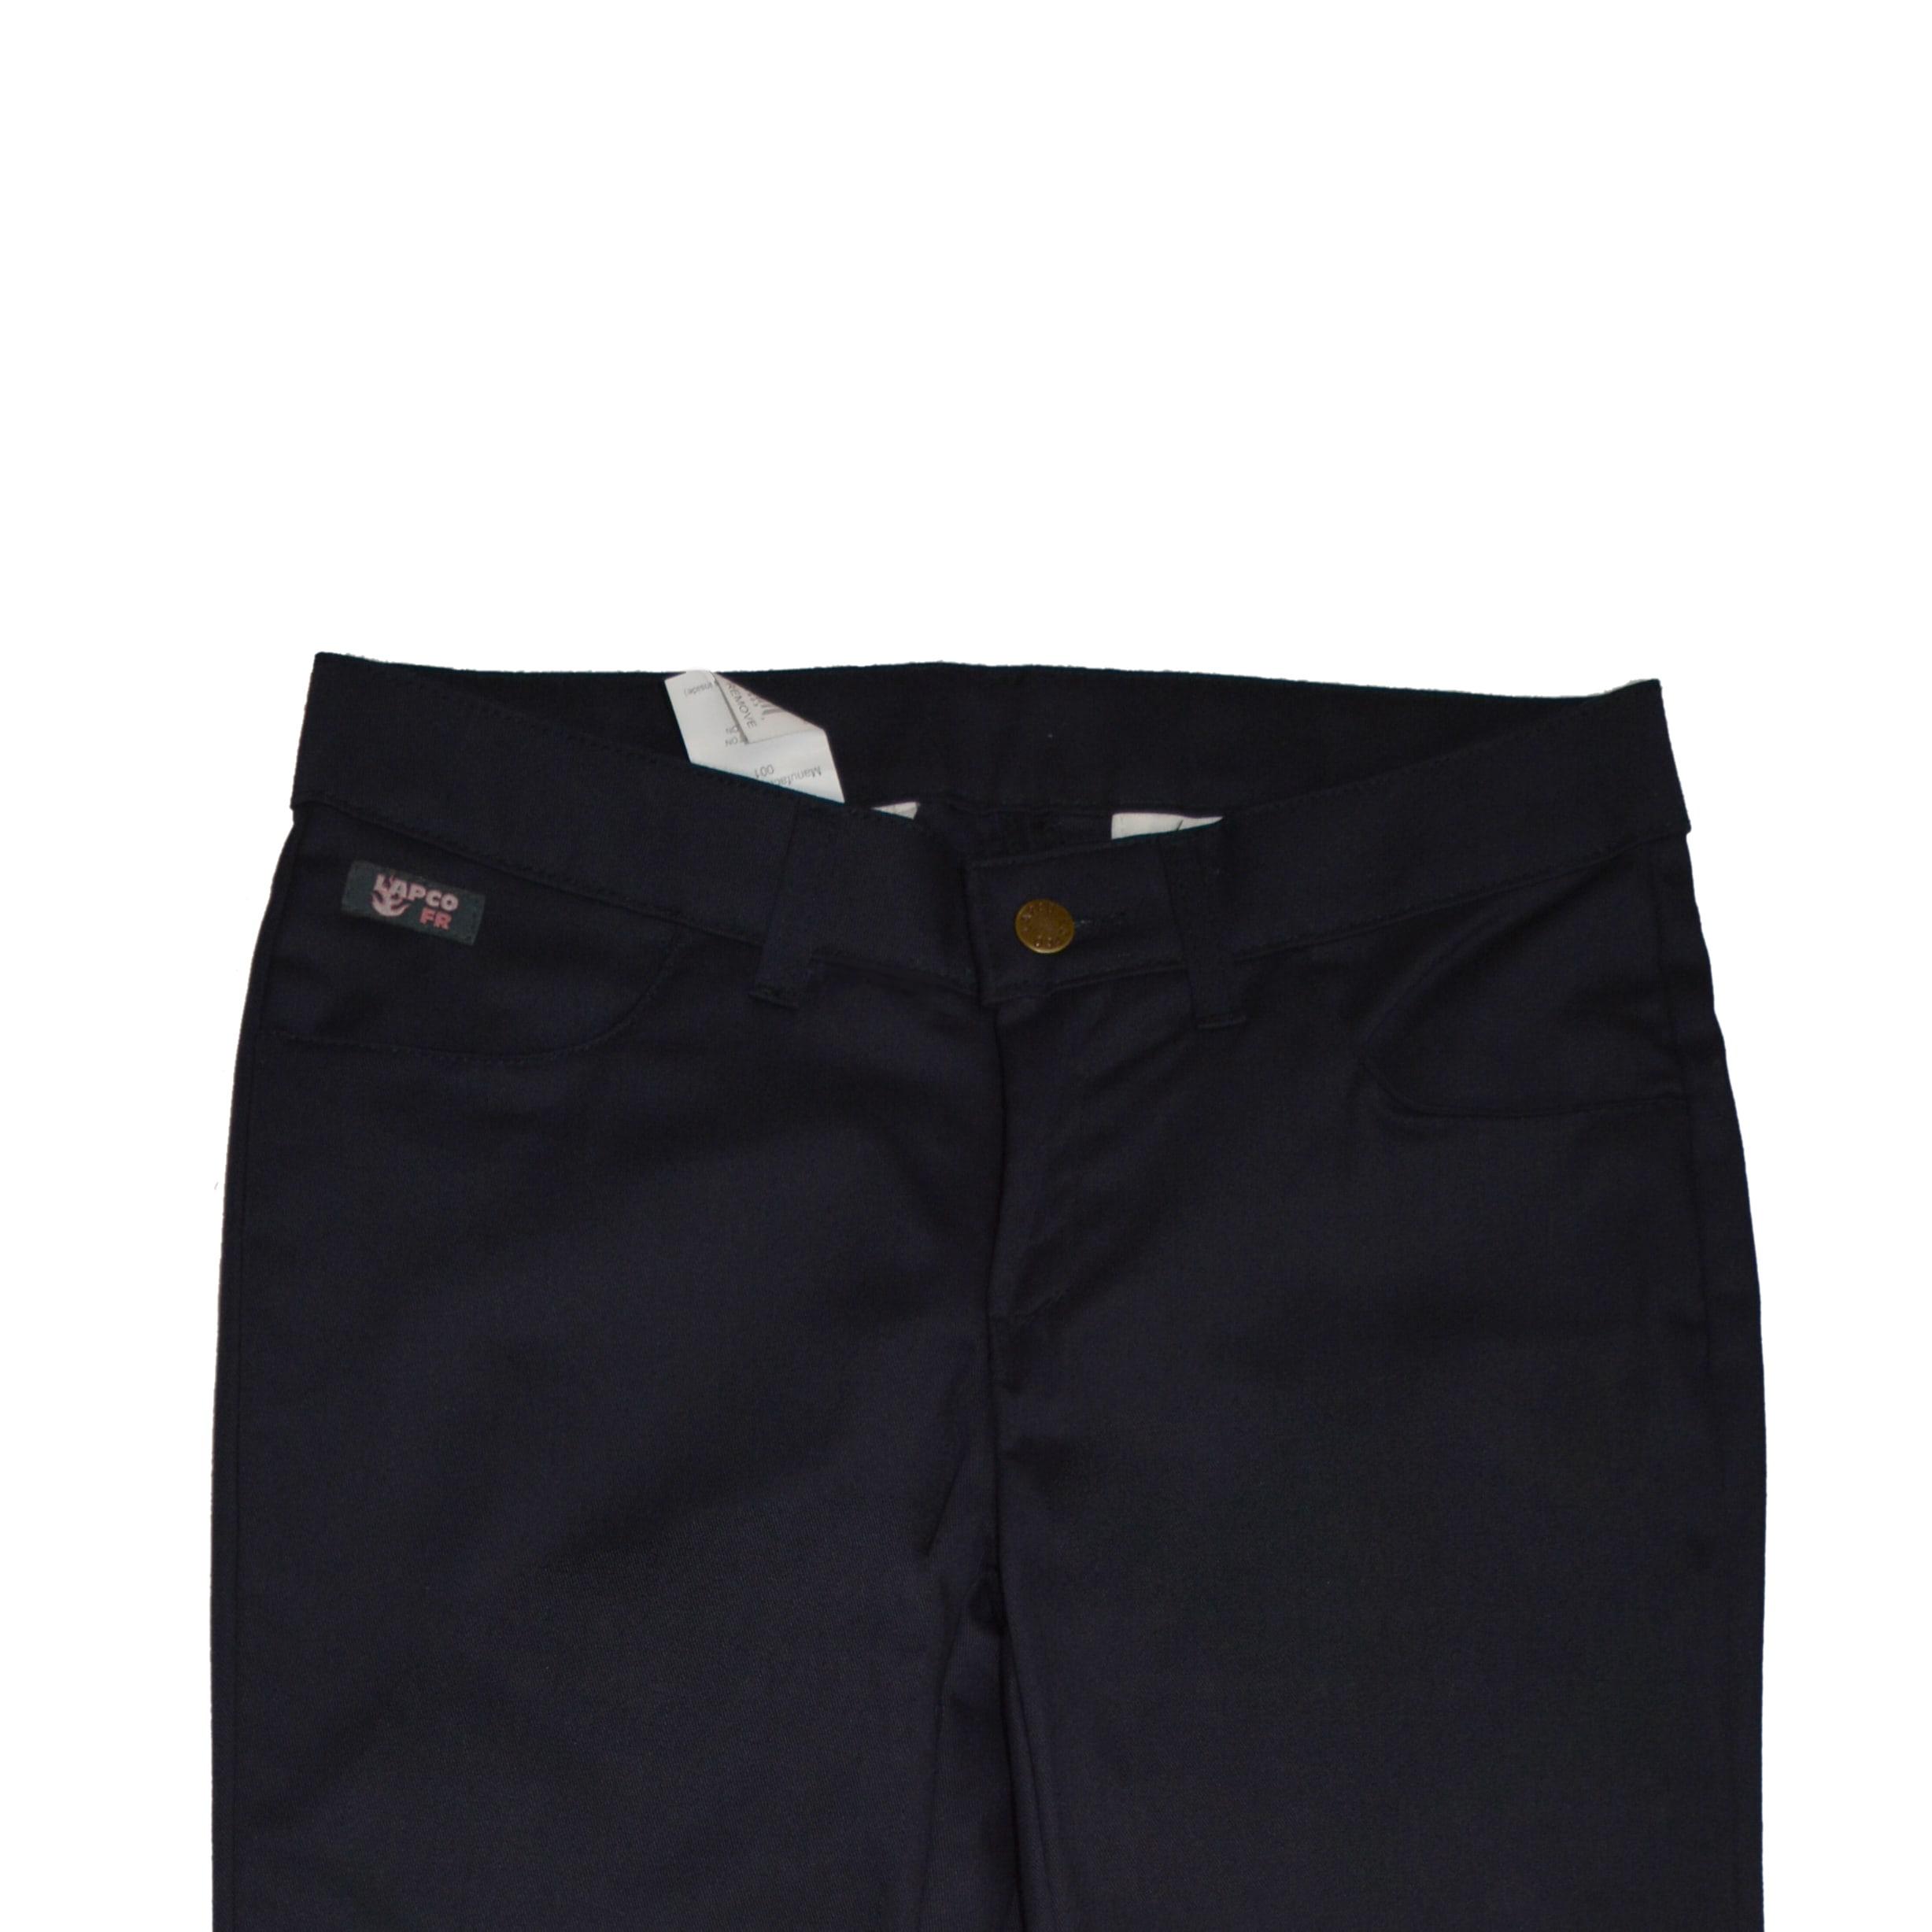 6aeb18886a10 ... Lapco Women s FR Navy Advanced Comfort Uniform Pants ...